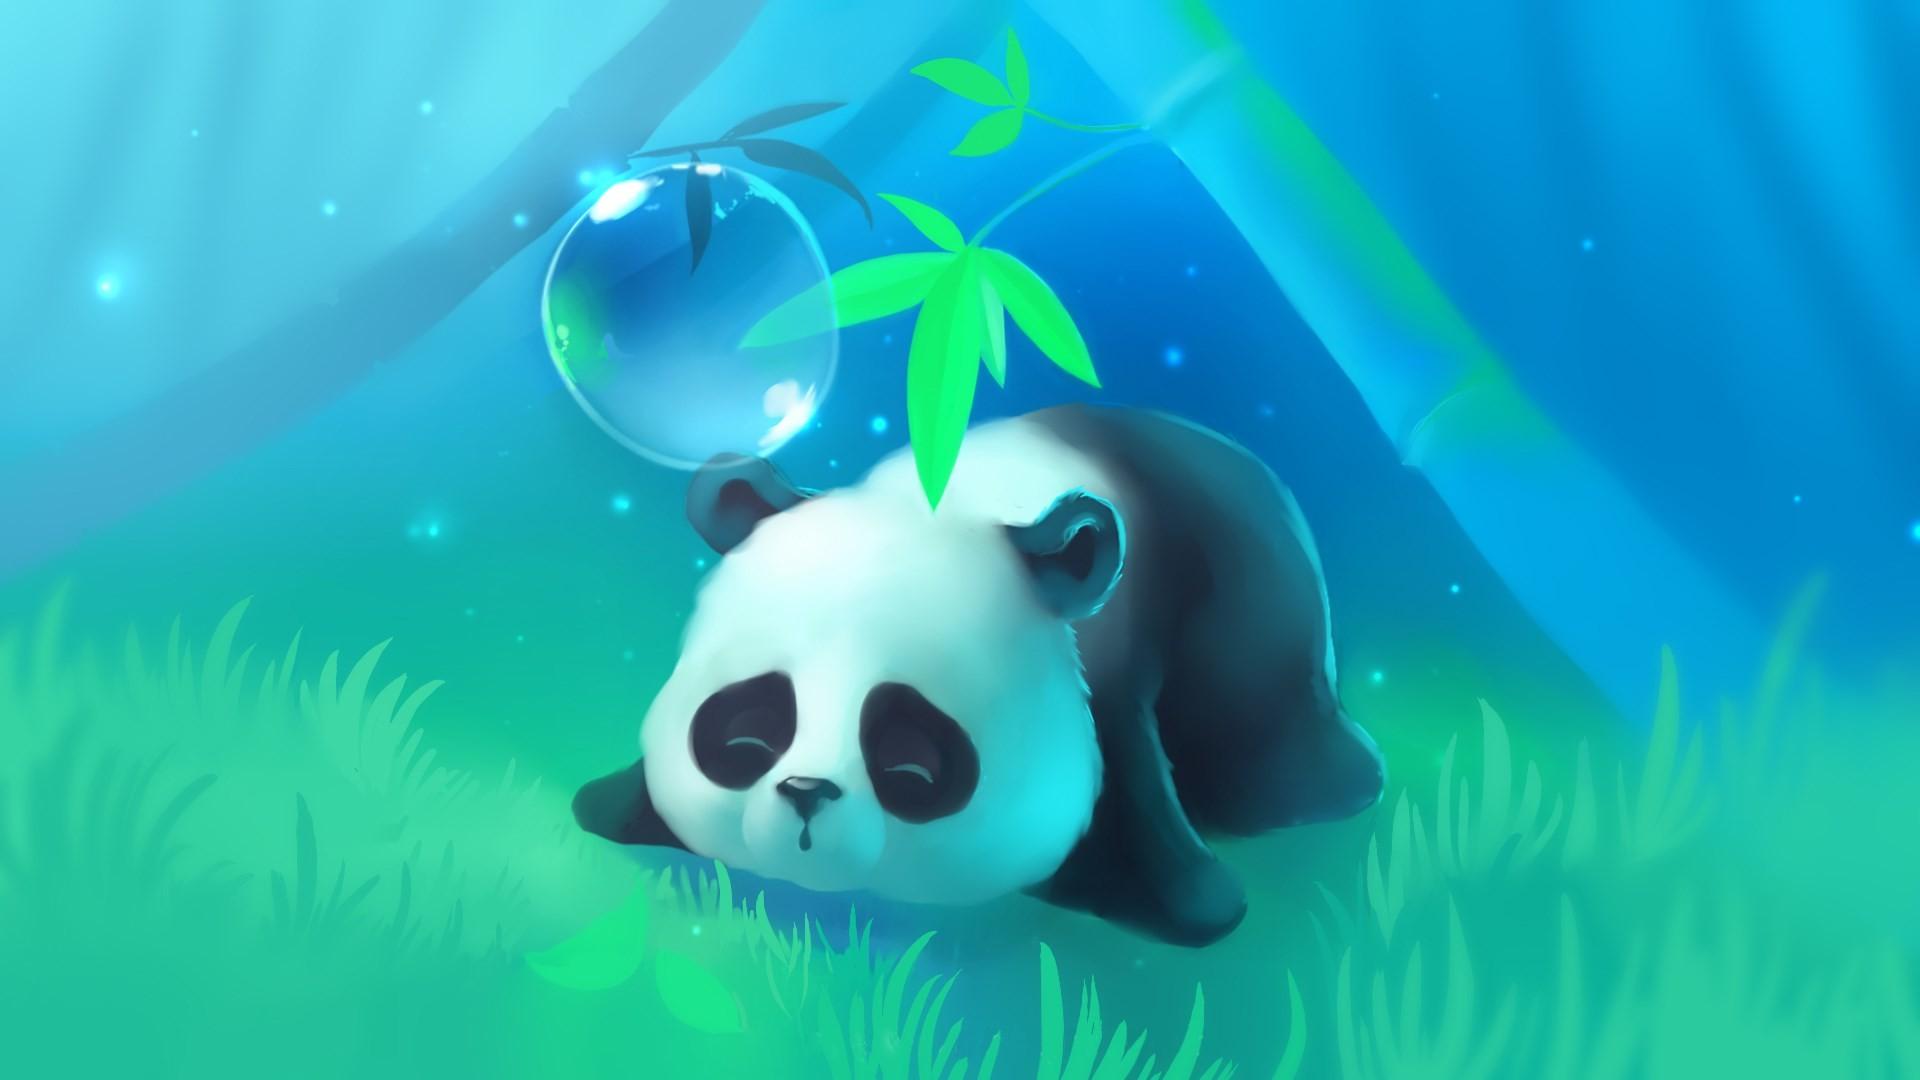 Cute panda tumblr themes - photo#37